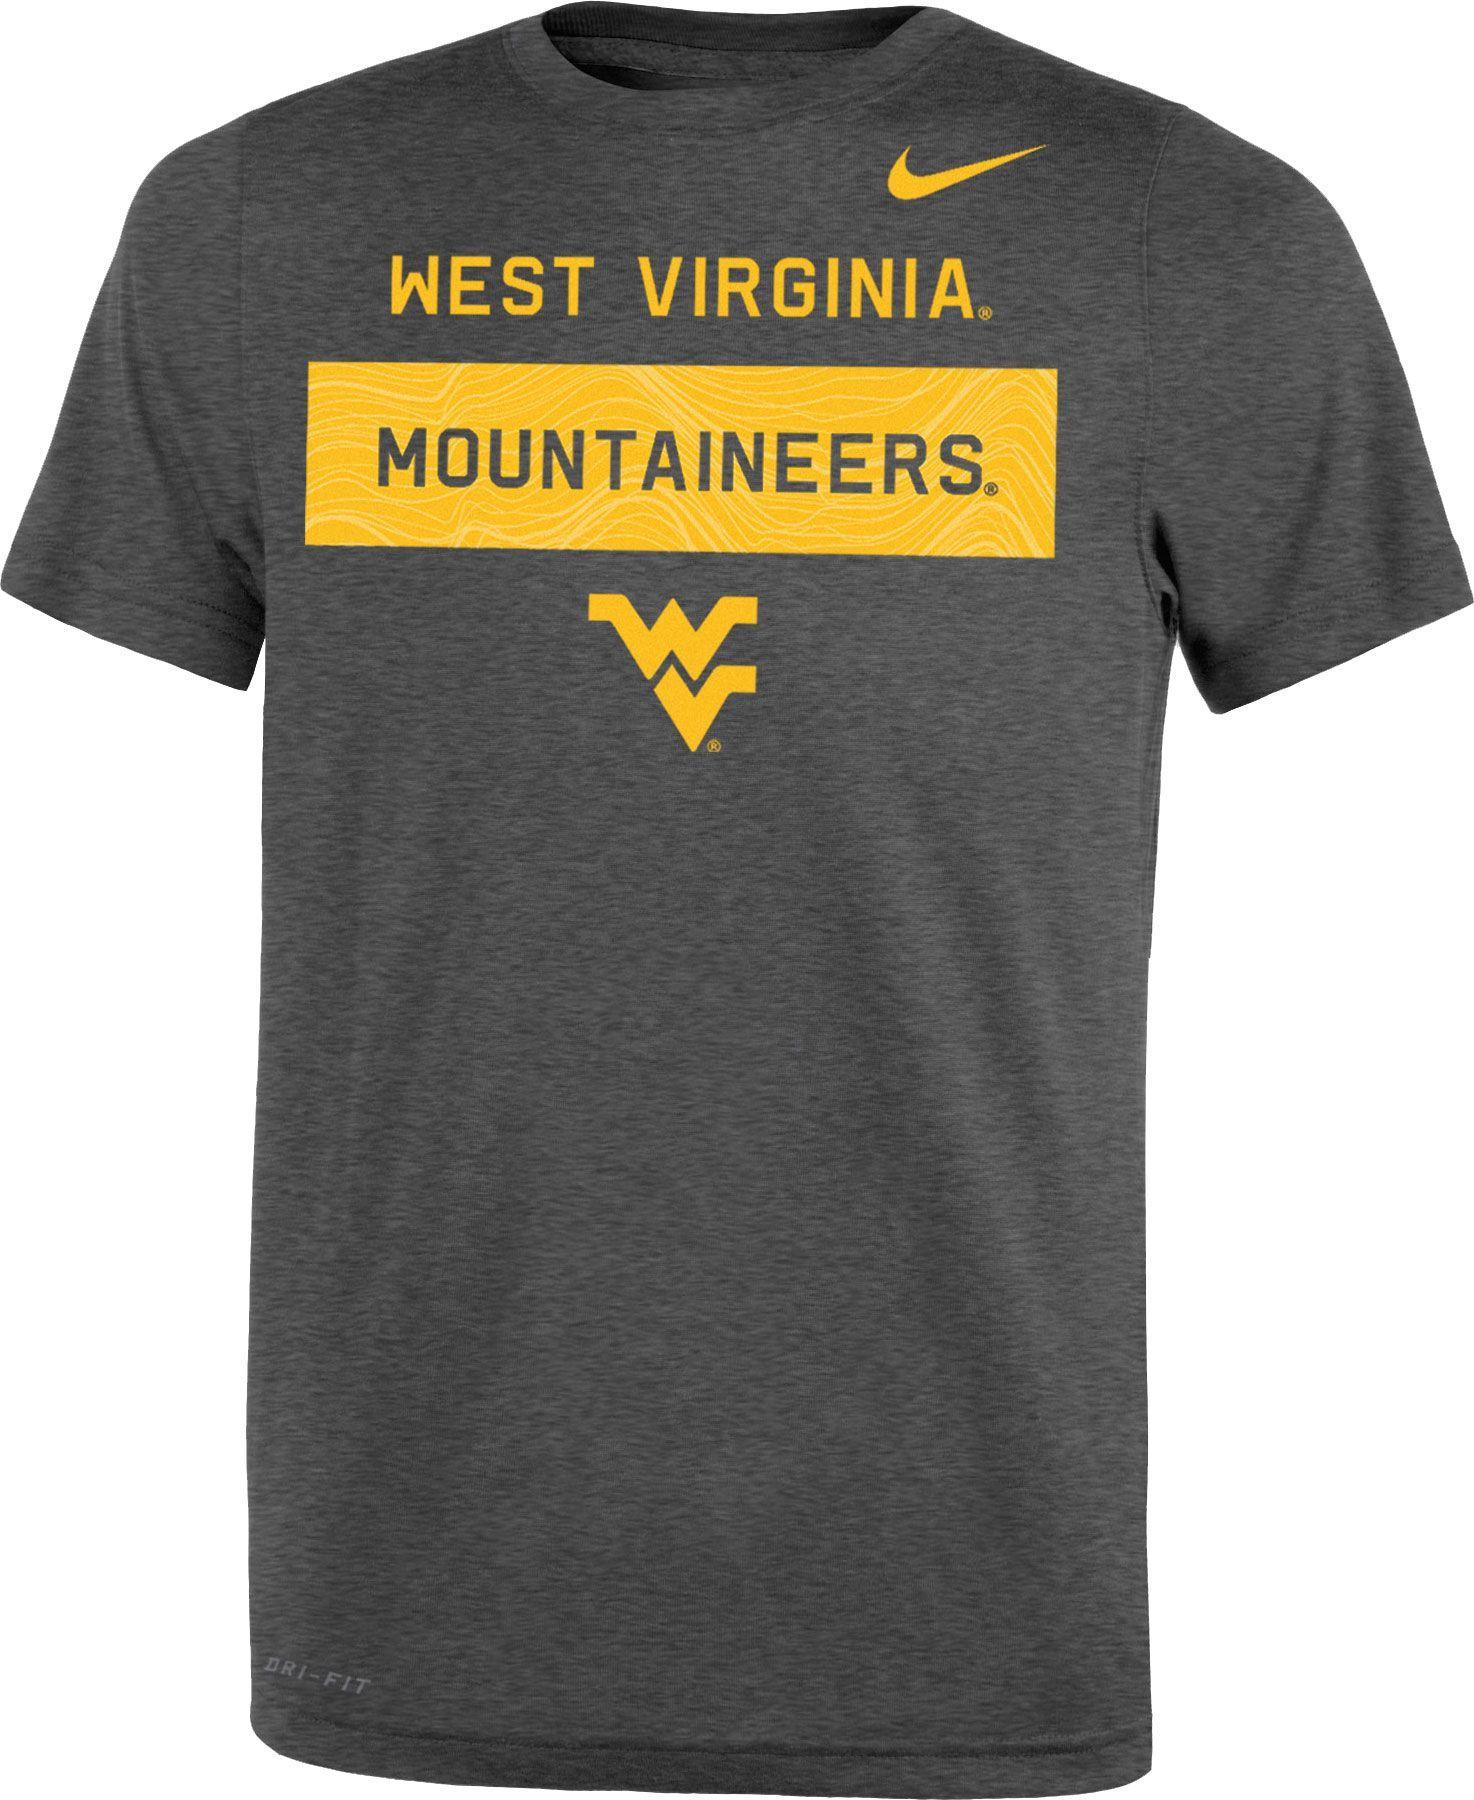 5c9e8c24e6f1 Nike Youth West Virginia Mountaineers Grey Dri-FIT Legend Lift Football T- Shirt